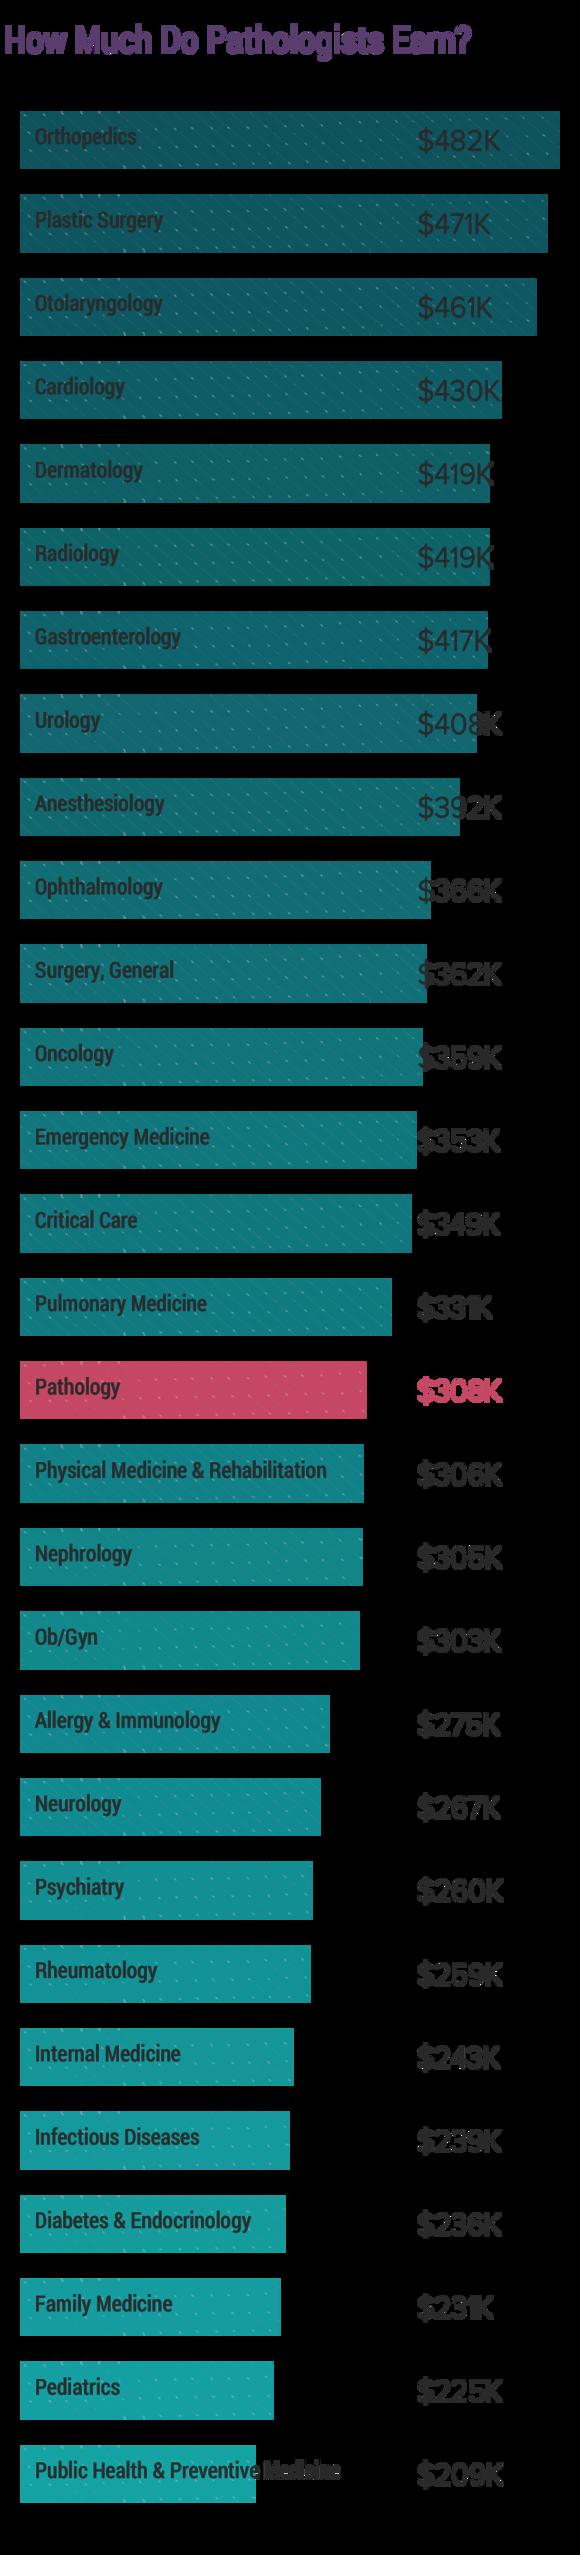 Medscape Pathologist Compensation Report 2019